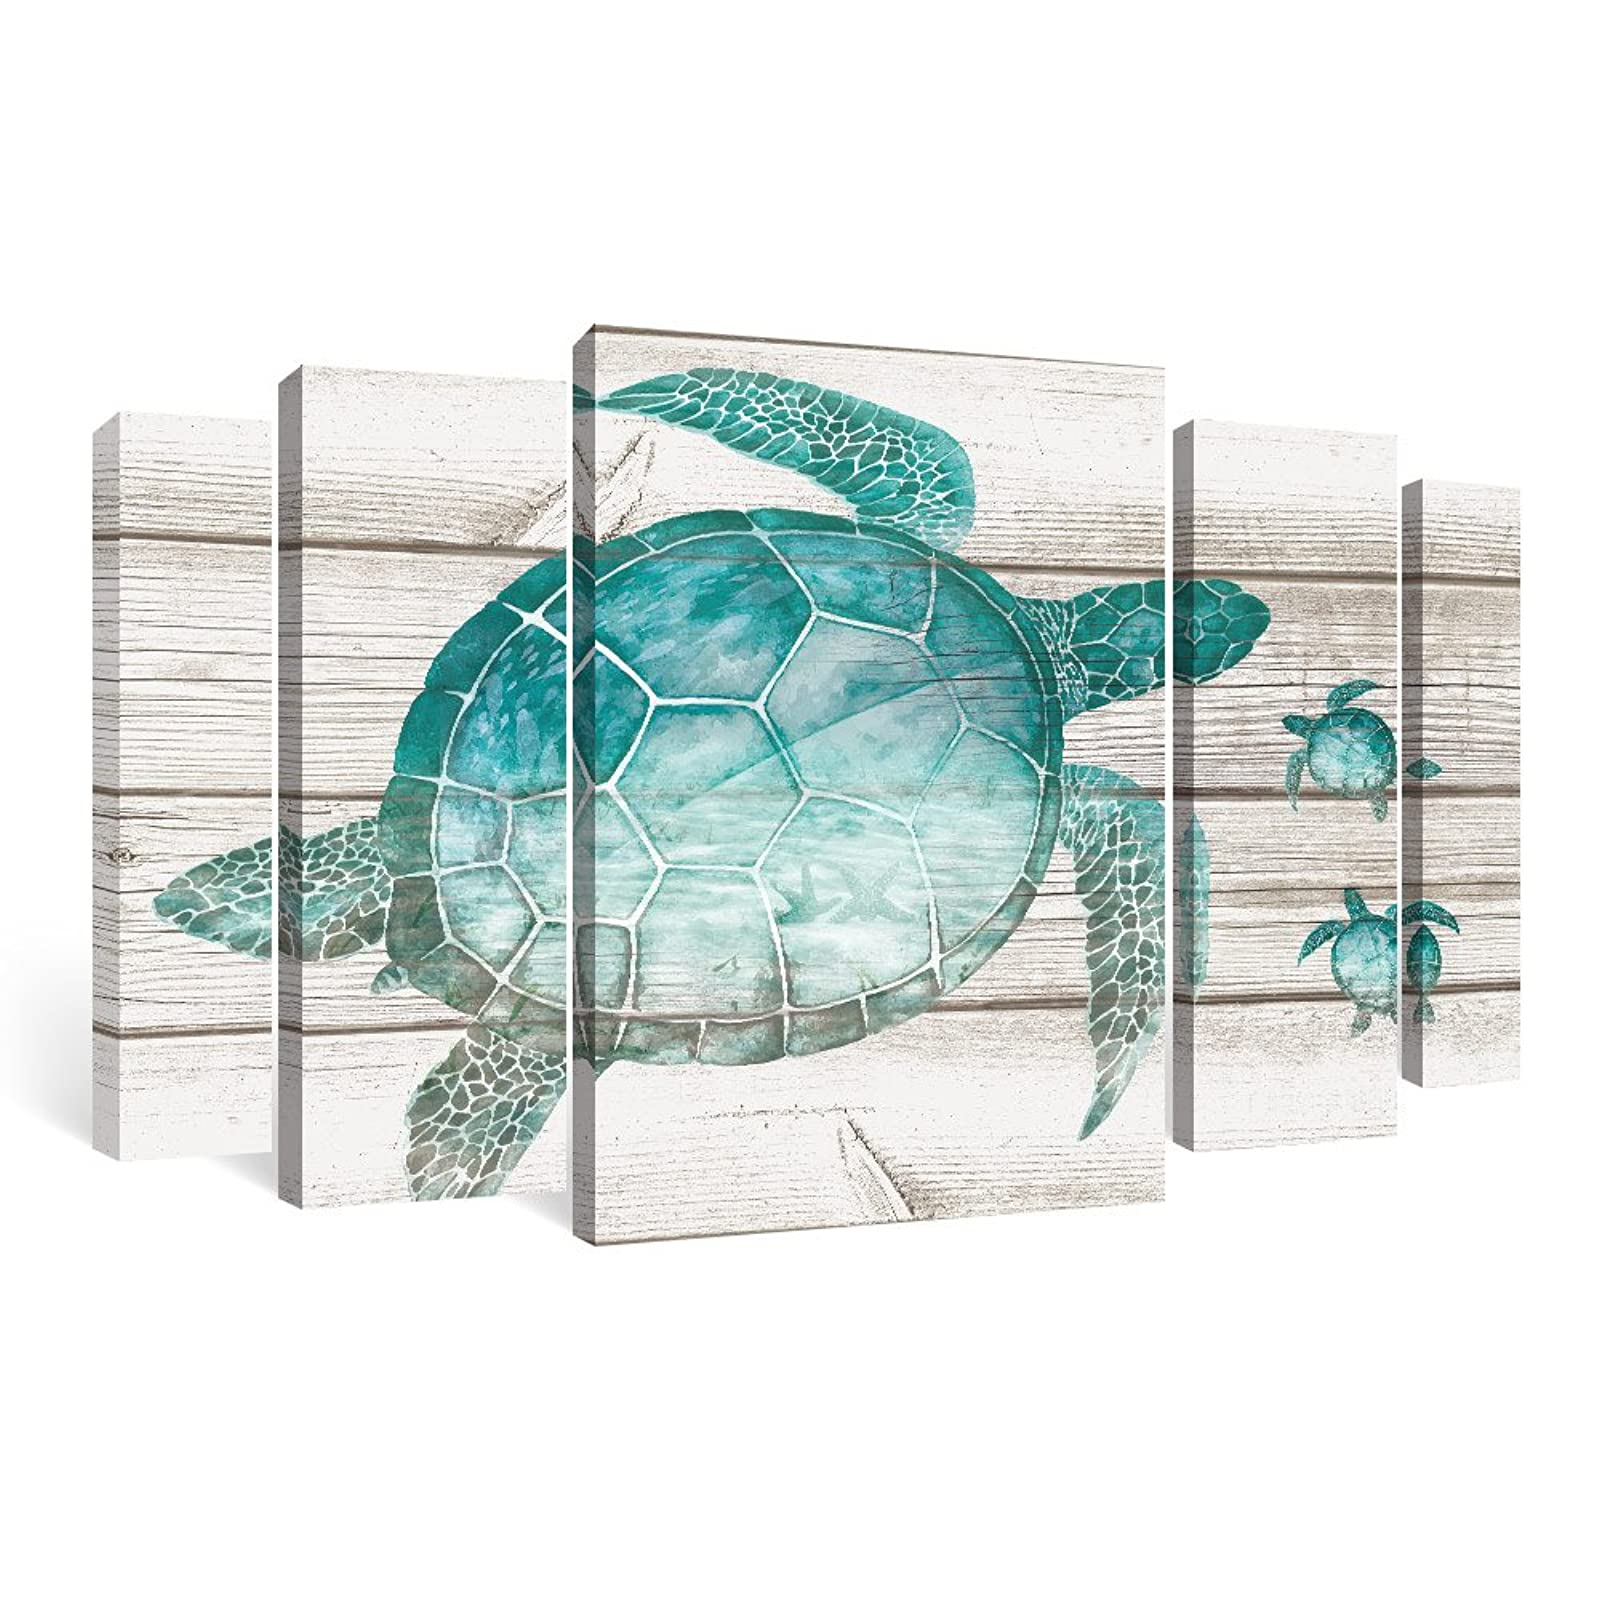 Sumgar Framed Wall Art Living Room Beach Pictures Teal Bathroom Decor Ocean Large Paintings Sea Turtle 5 Piece Walmart Com Walmart Com